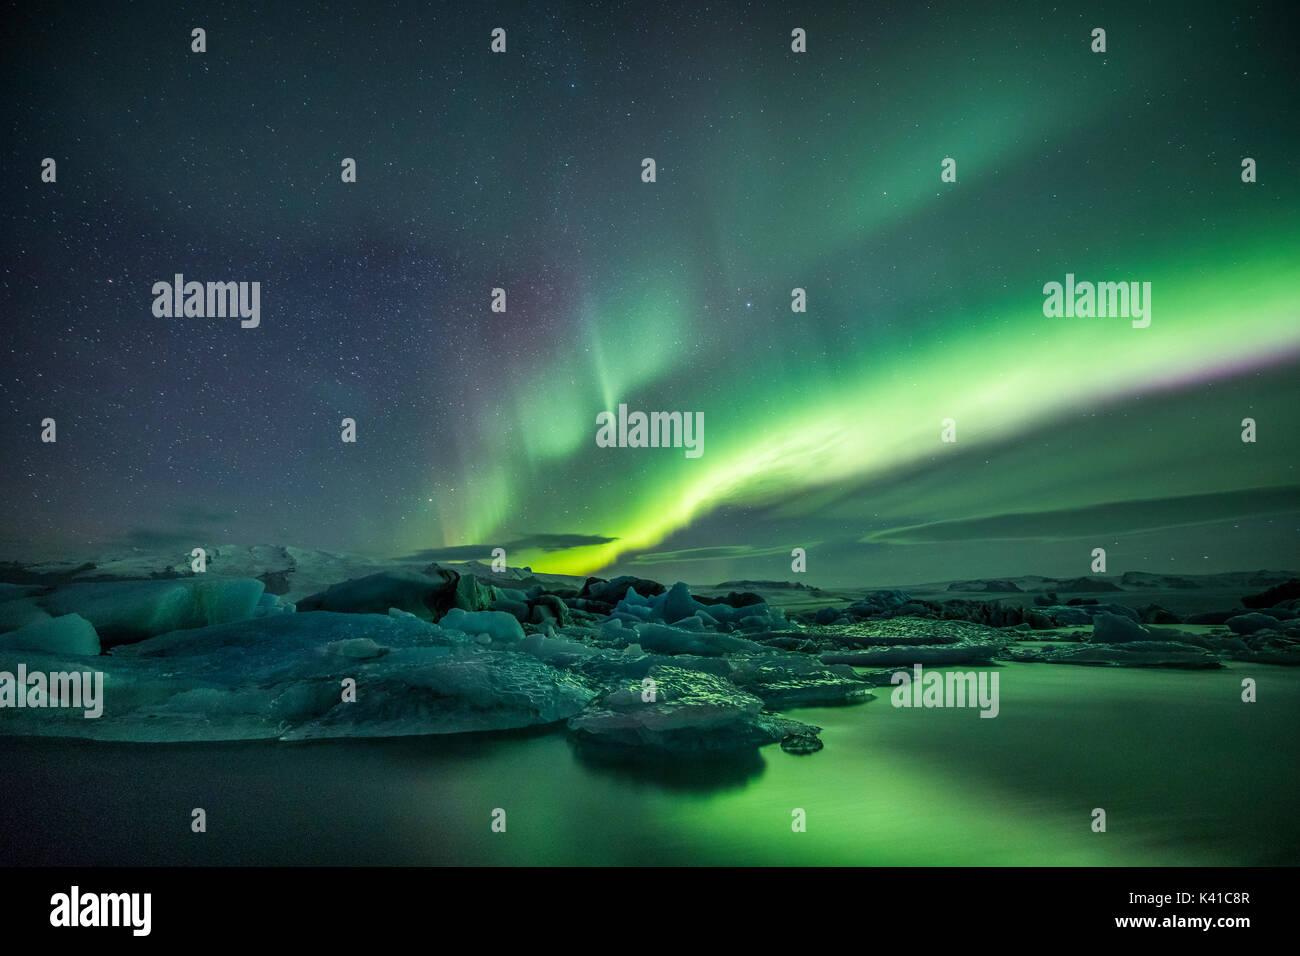 Jökulsárlón and Aurora in Iceland - Stock Image